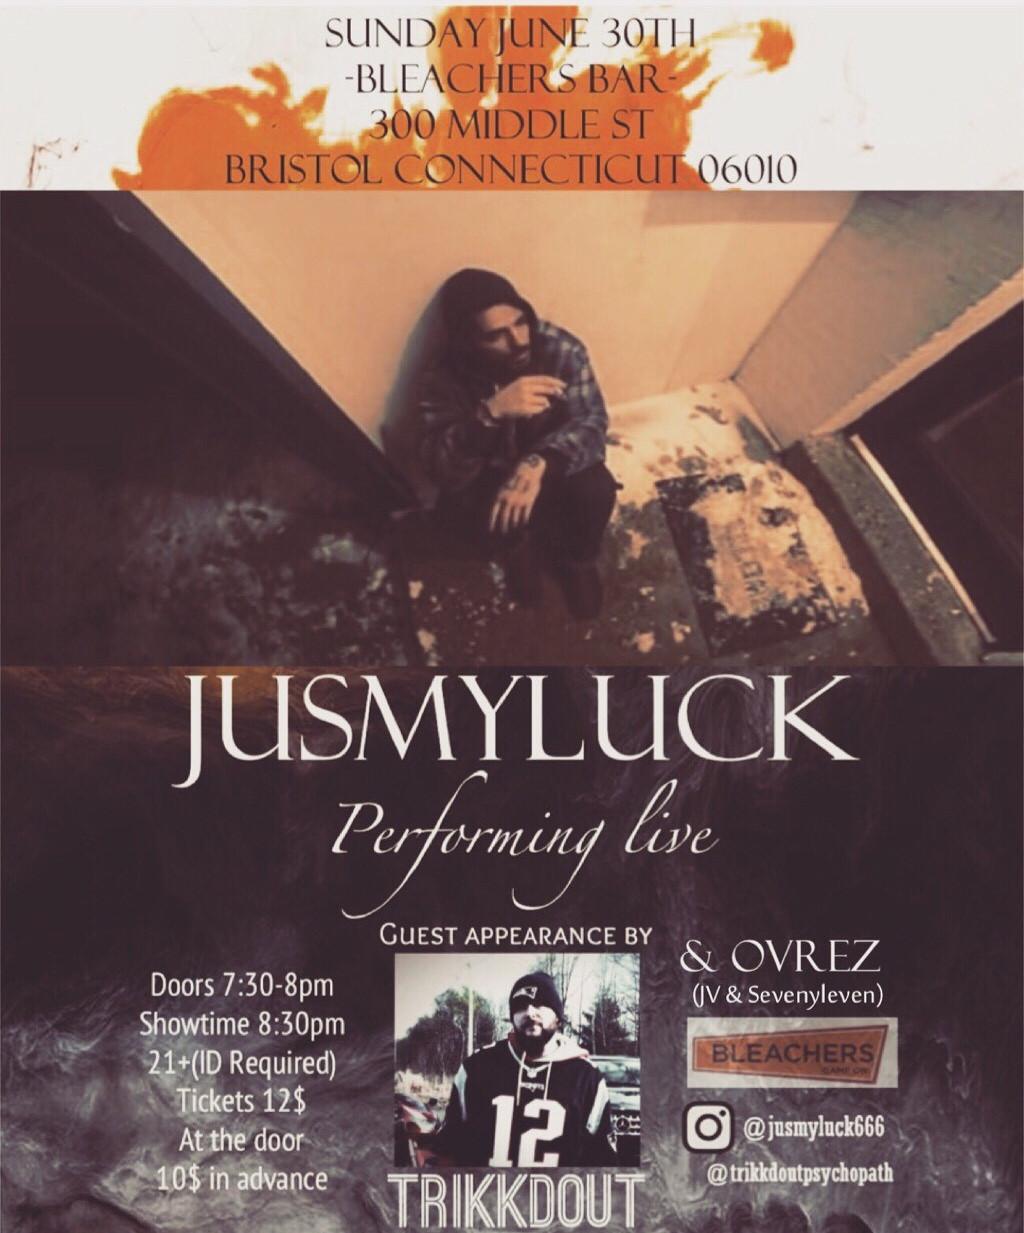 JusMyLuck (ft. Trikkdout) - Bristol, CT